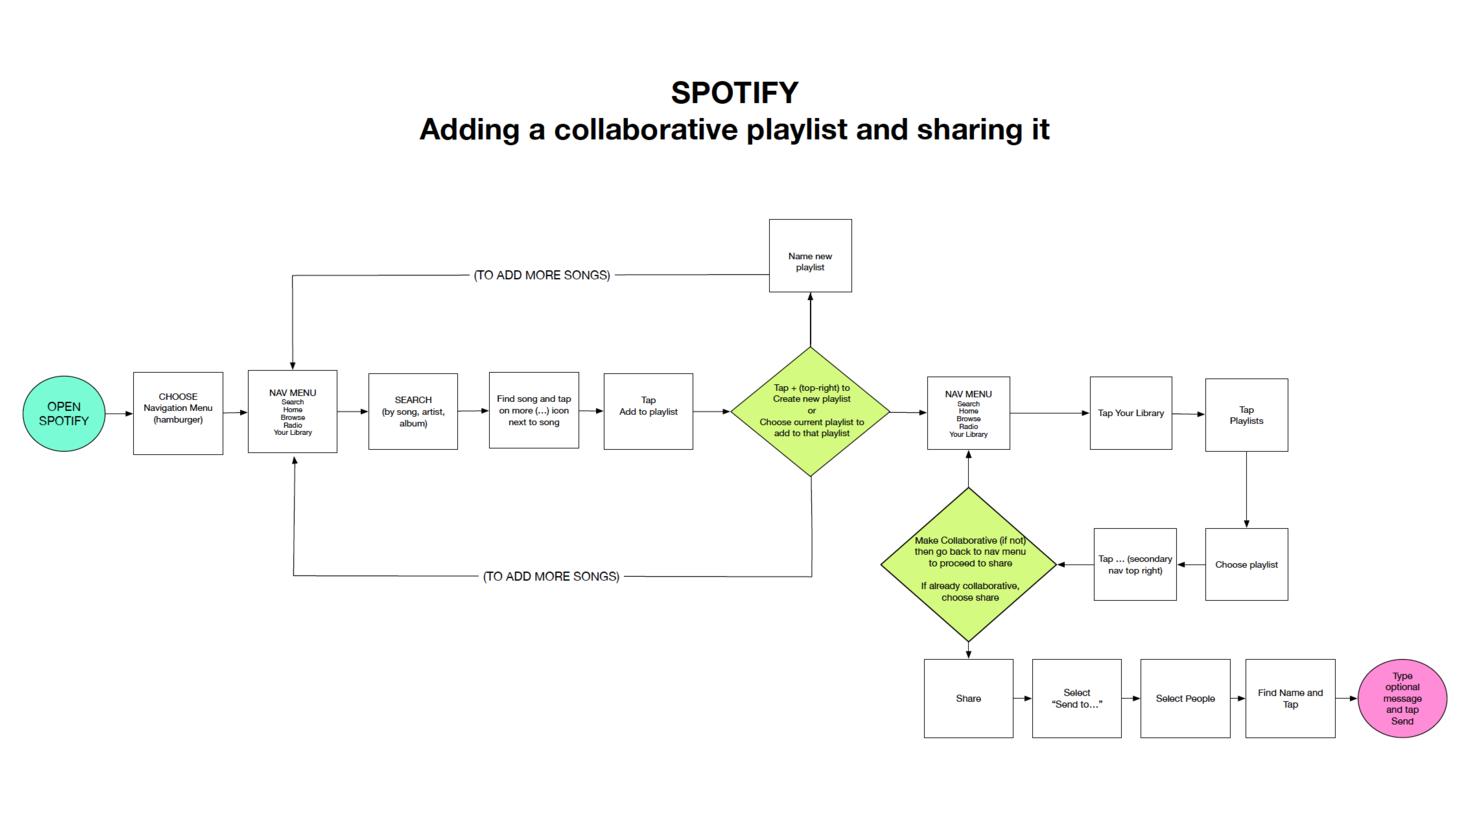 Spotify. Adding a collaborative playlist